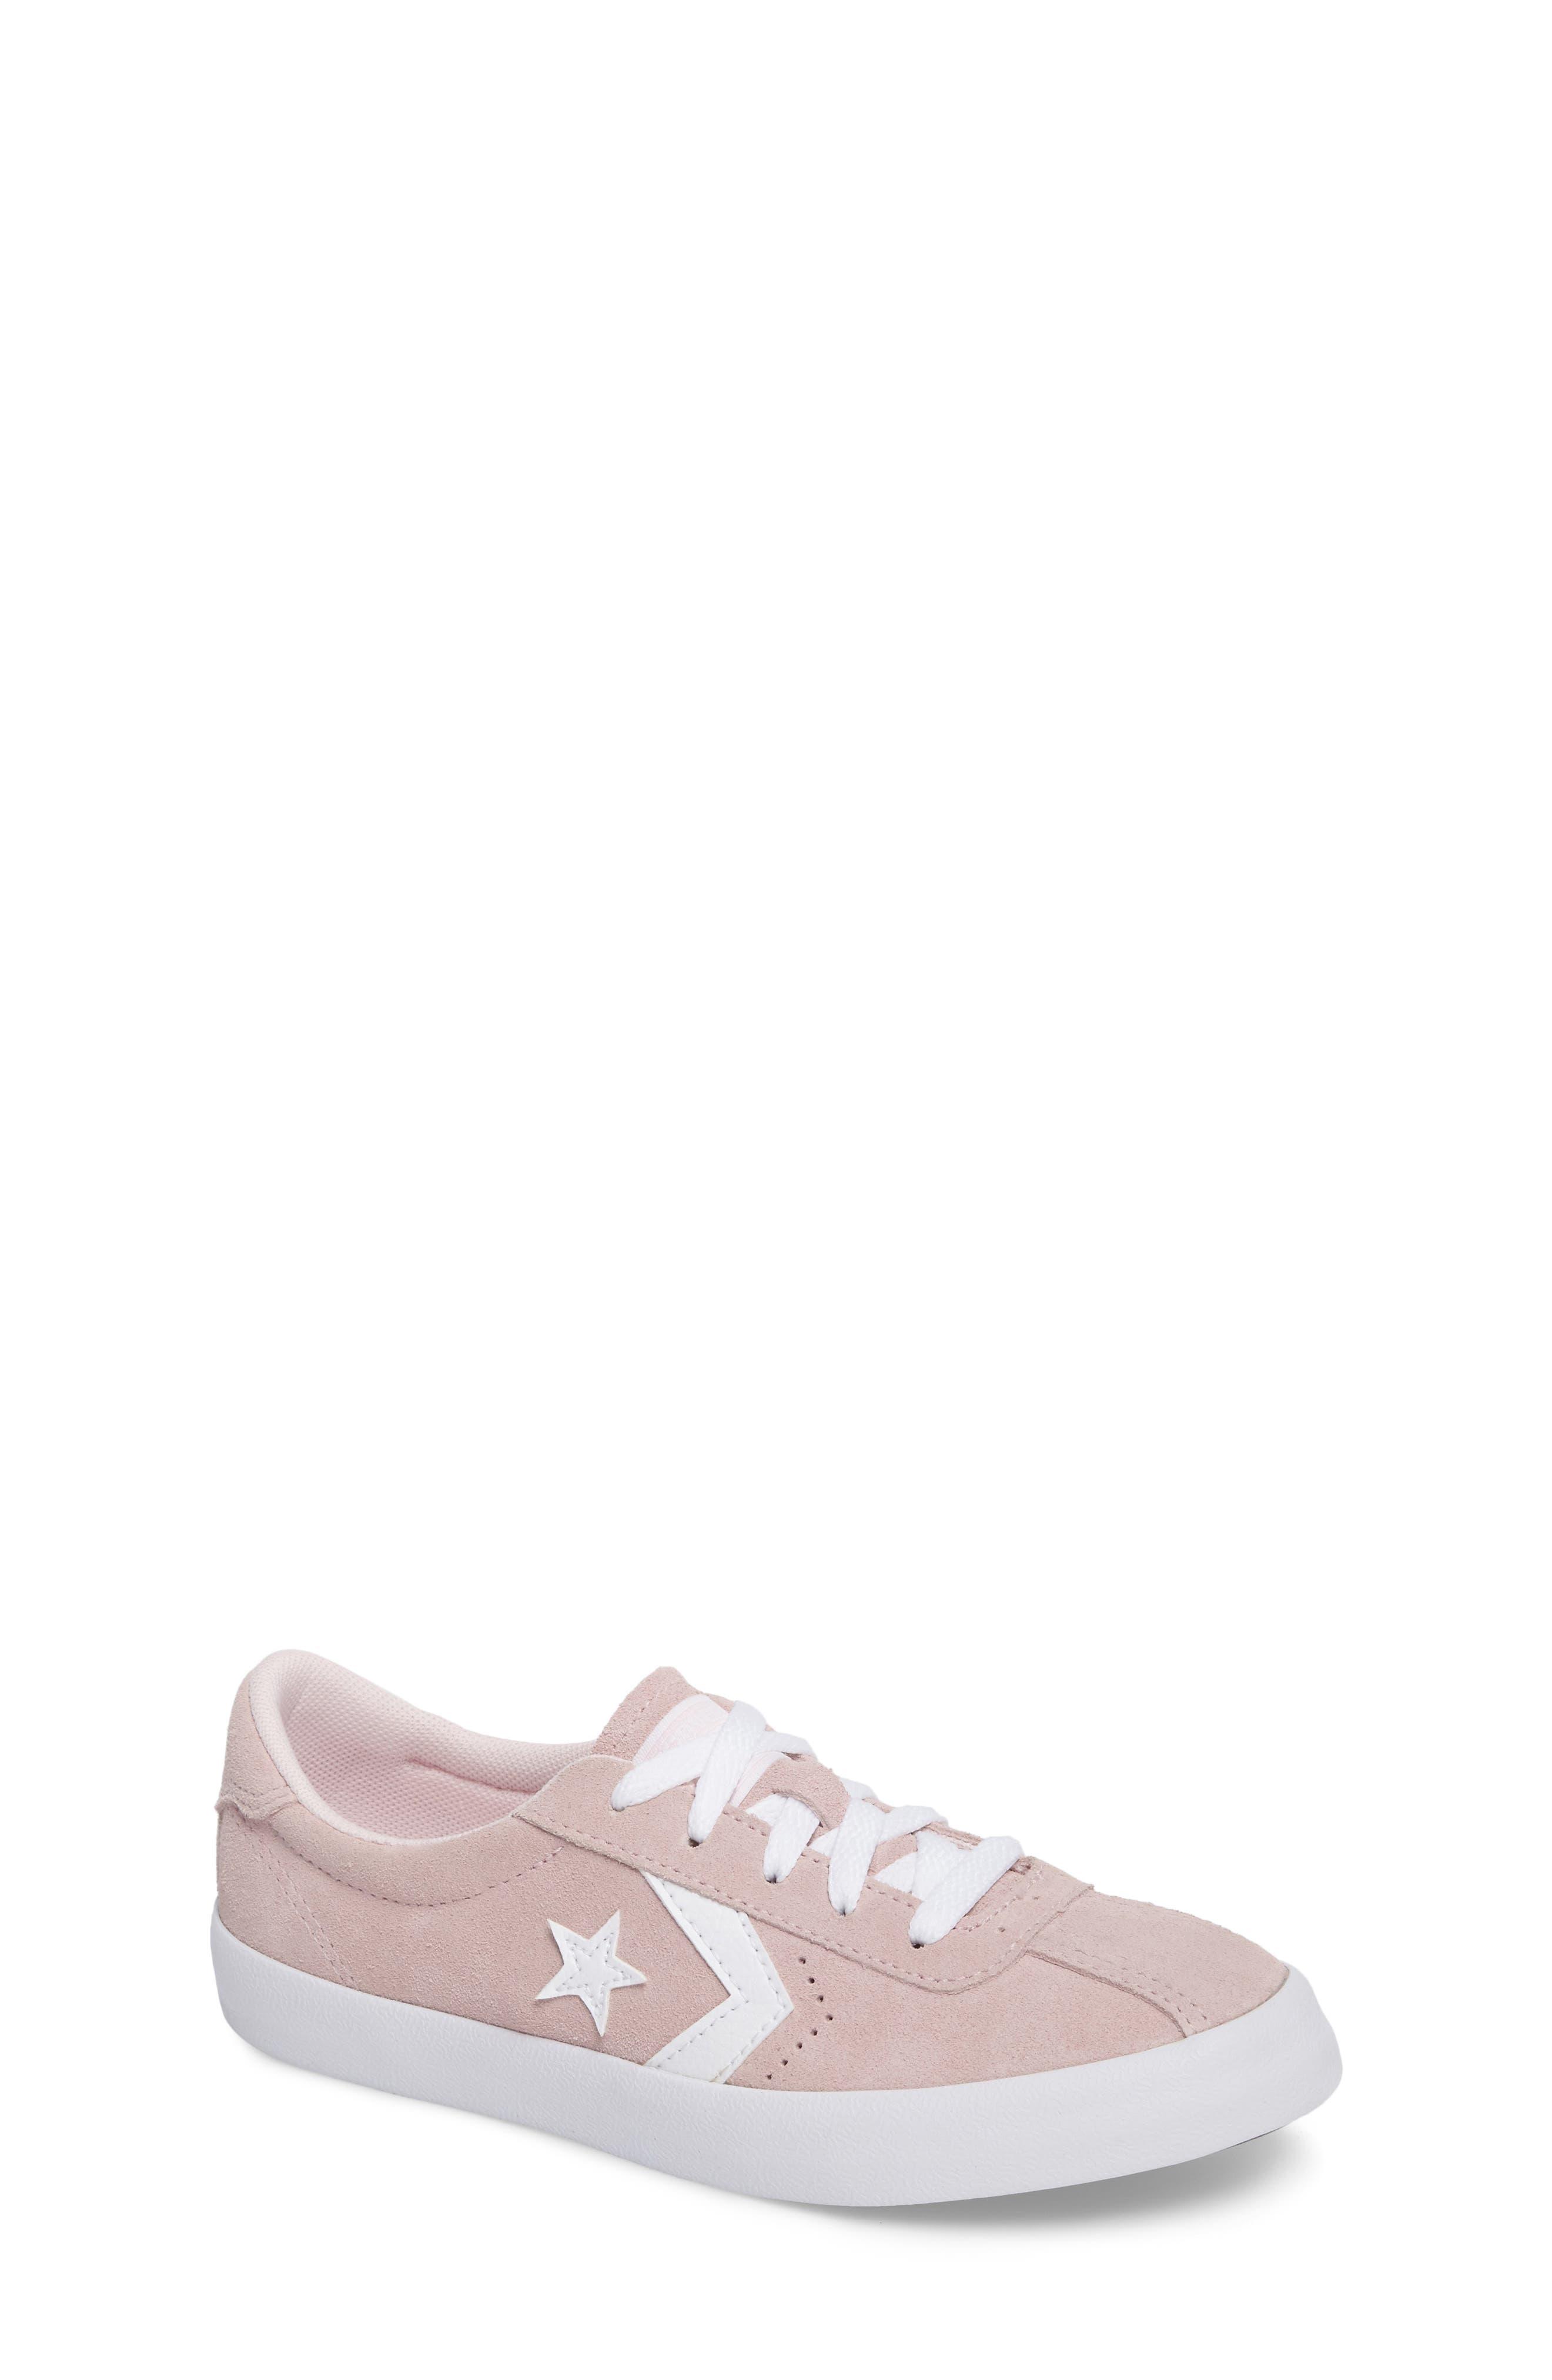 Converse Breakpoint Sneaker (Toddler, Little Kid & Big Kid)